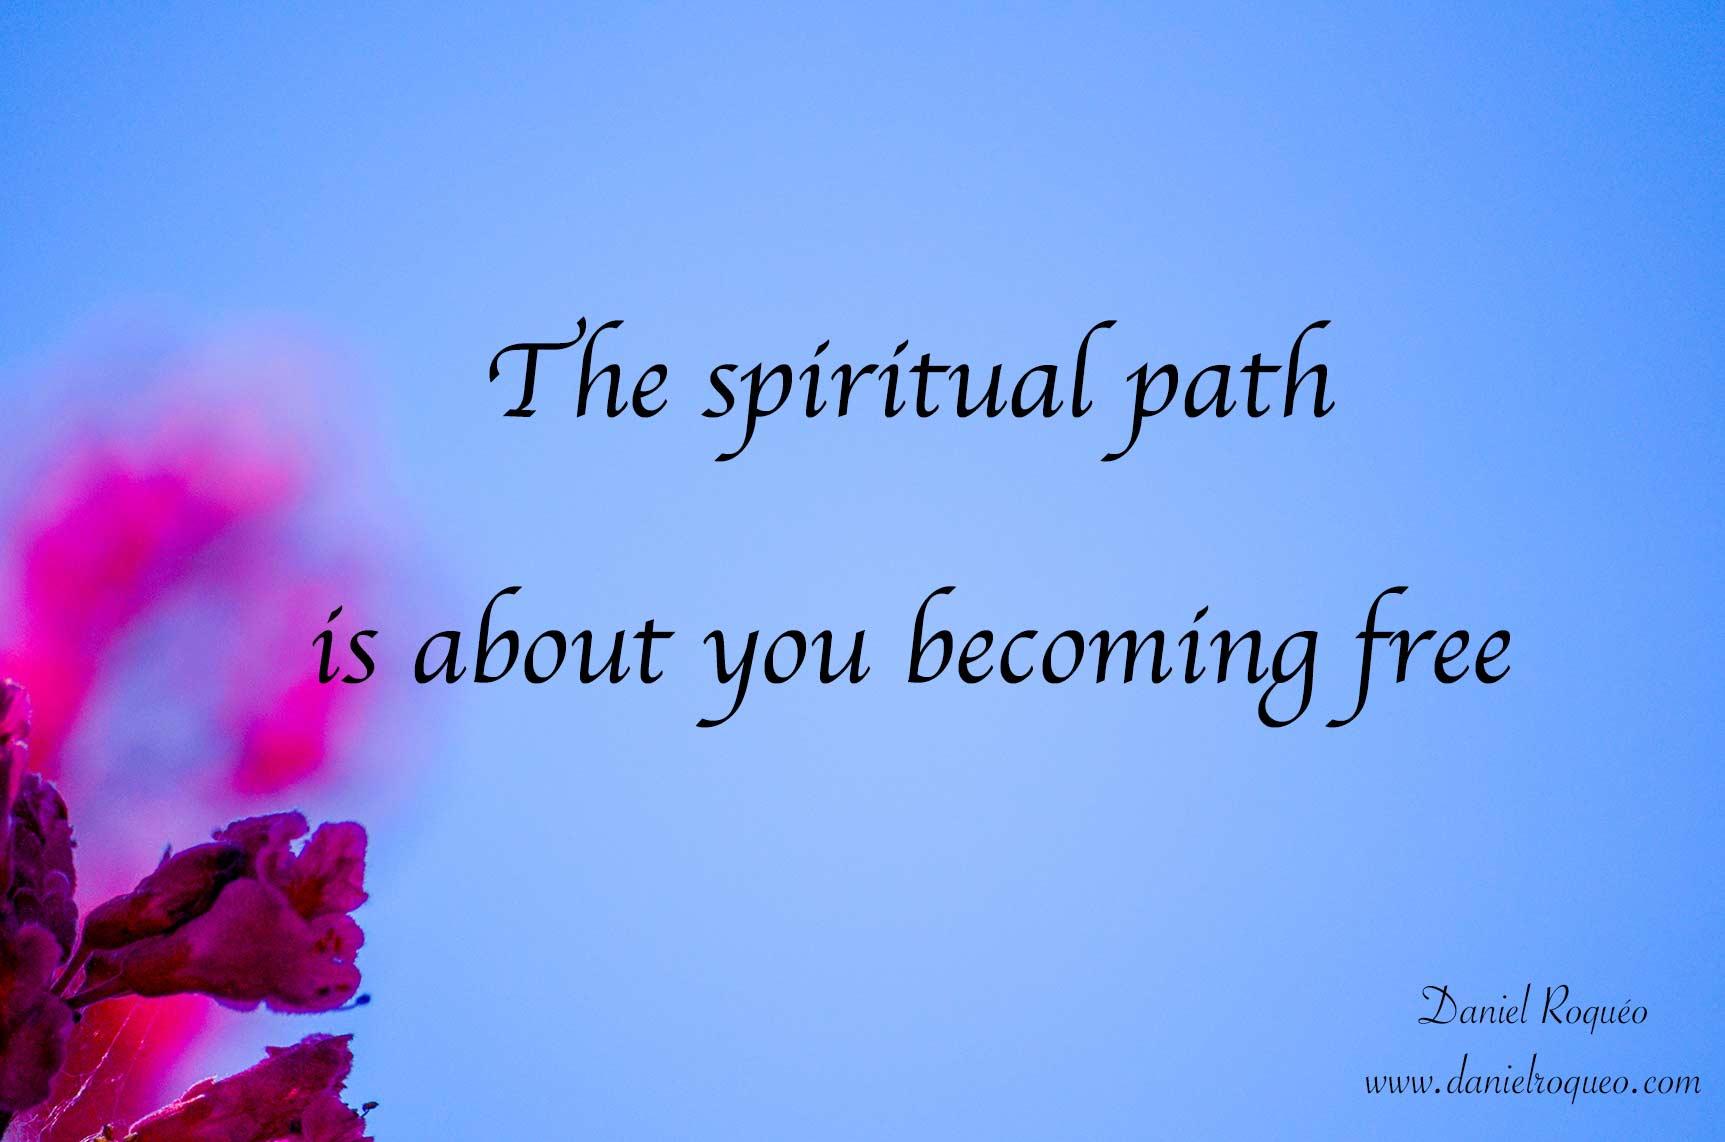 As a spiritual counselor I help you become free